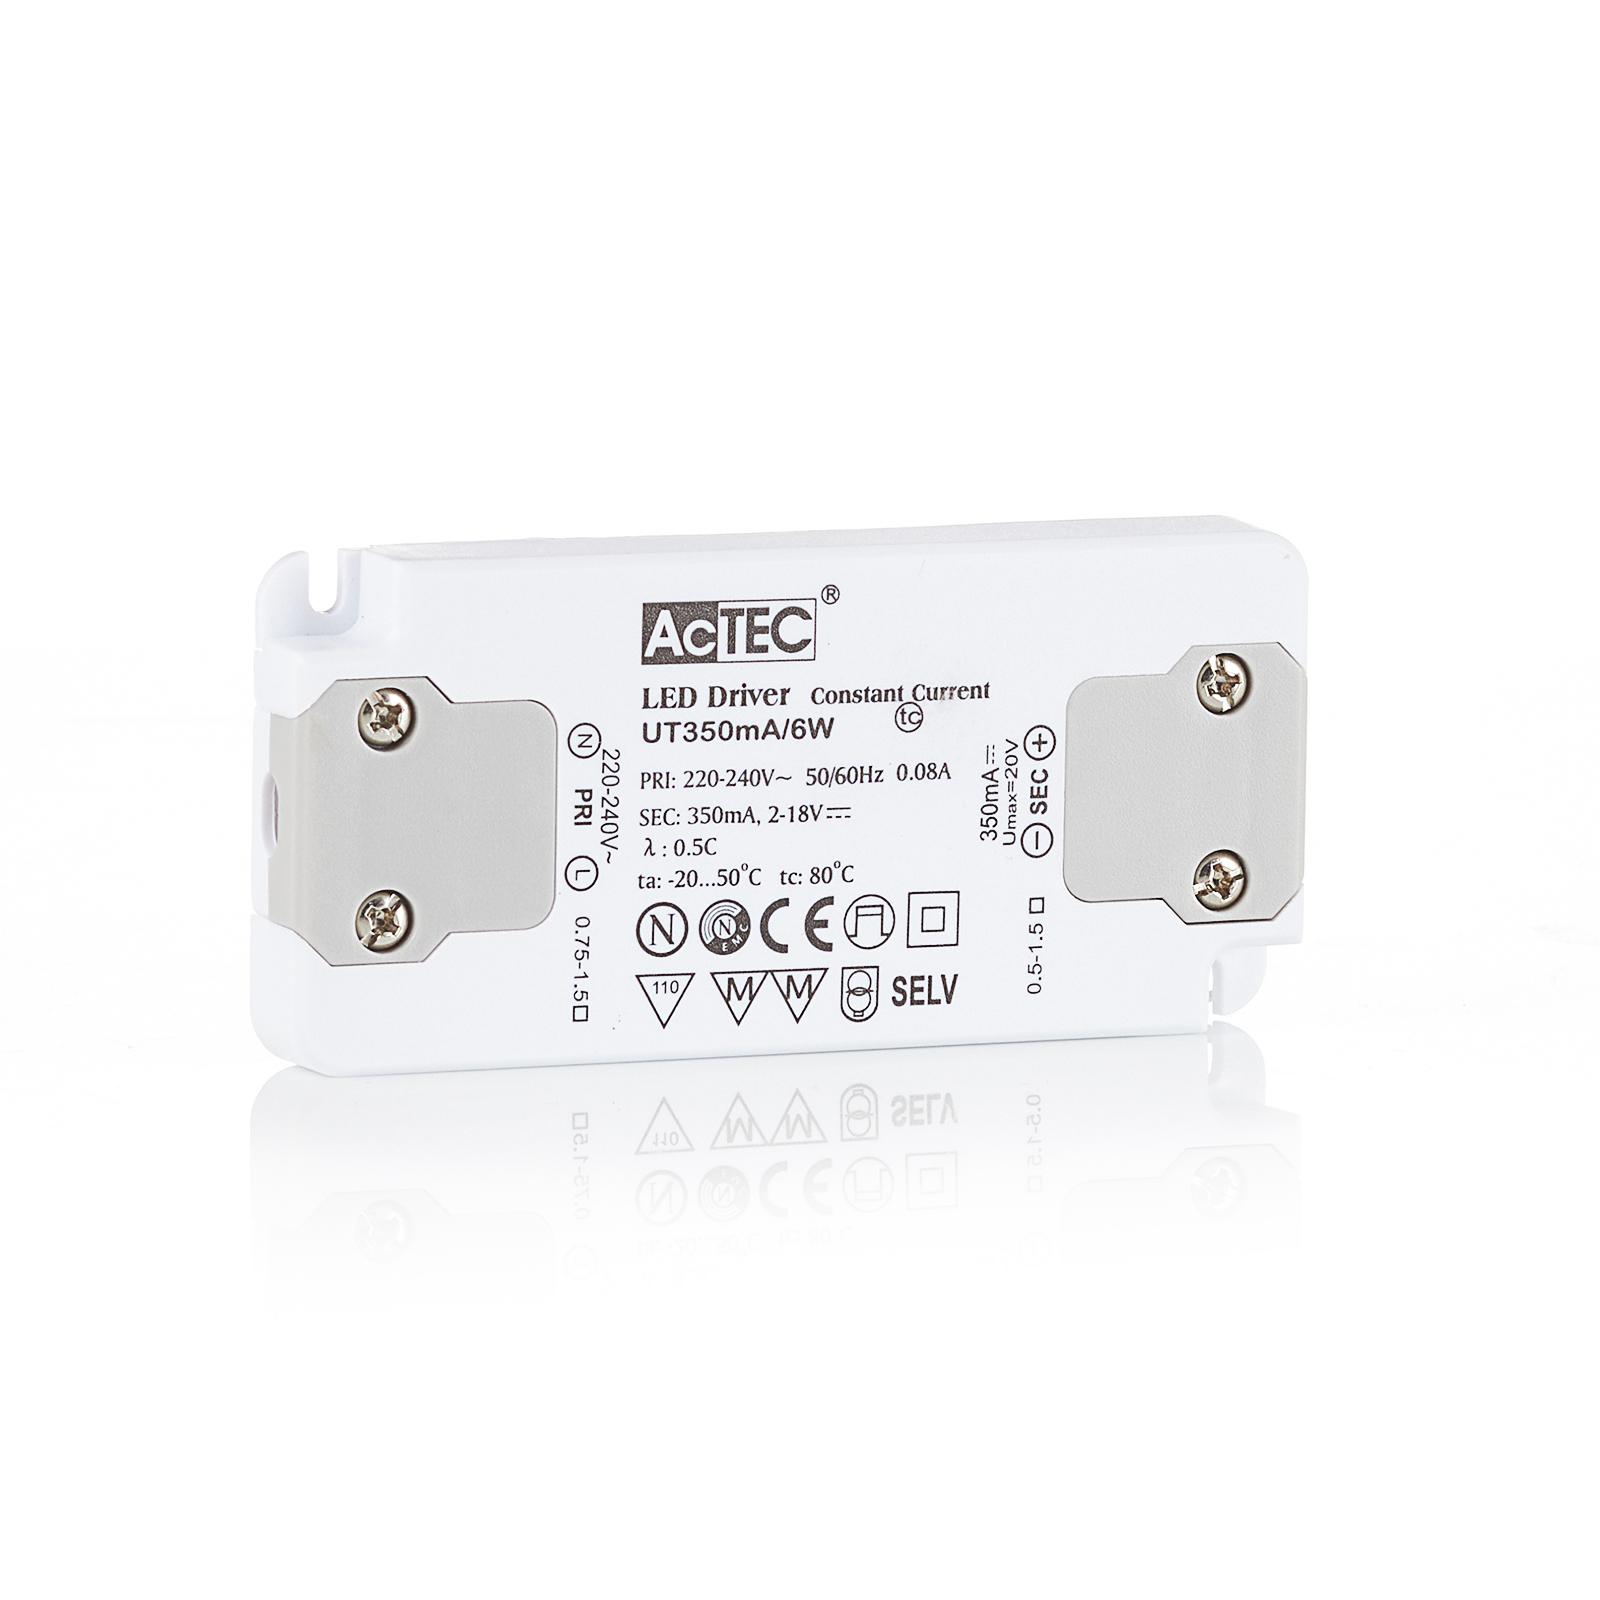 AcTEC Slim LED driver CC 350mA, 6W